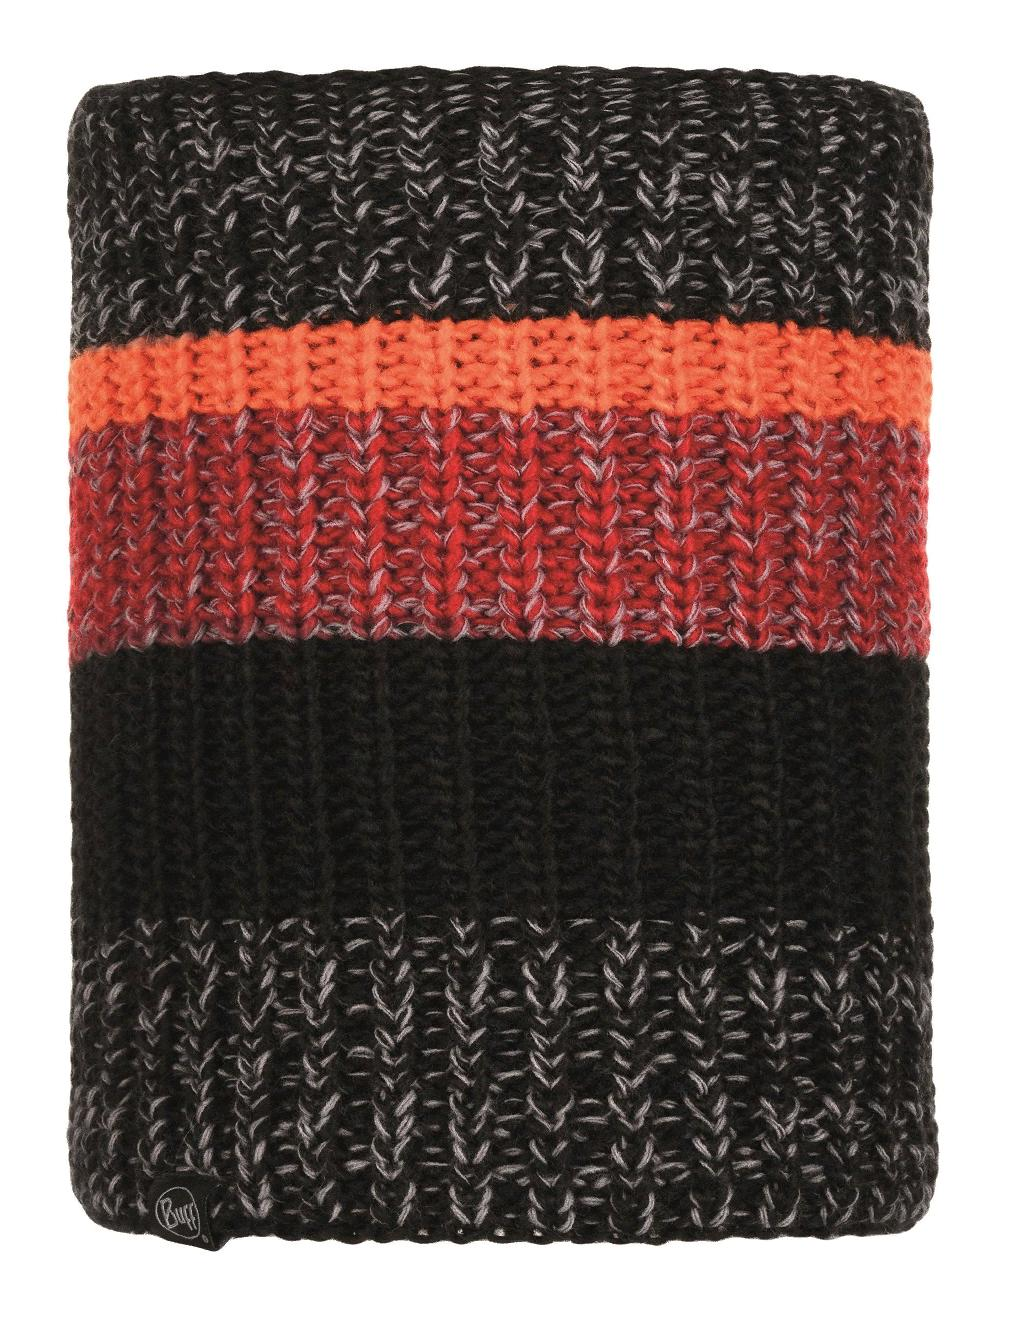 Купить Шарф BUFF KNITTED & POLAR NECKWARMER STIG BLACK, Банданы и шарфы Buff ®, 1377380